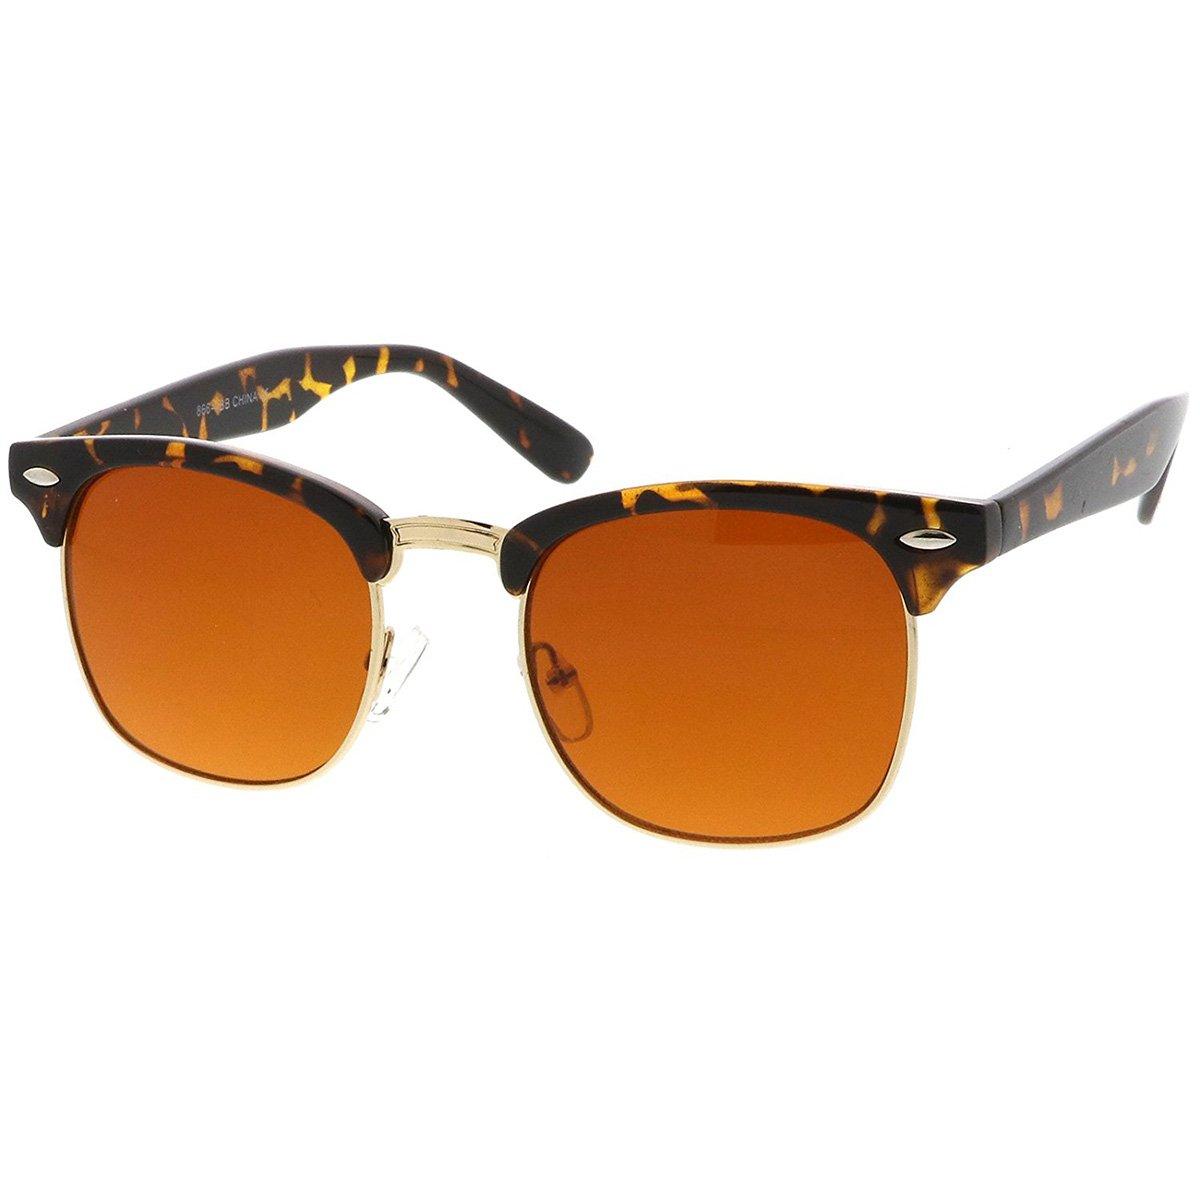 KISS Gafas de sol BLUE BLOCKER mod. DANDY Cult - Lente Ámbar ...